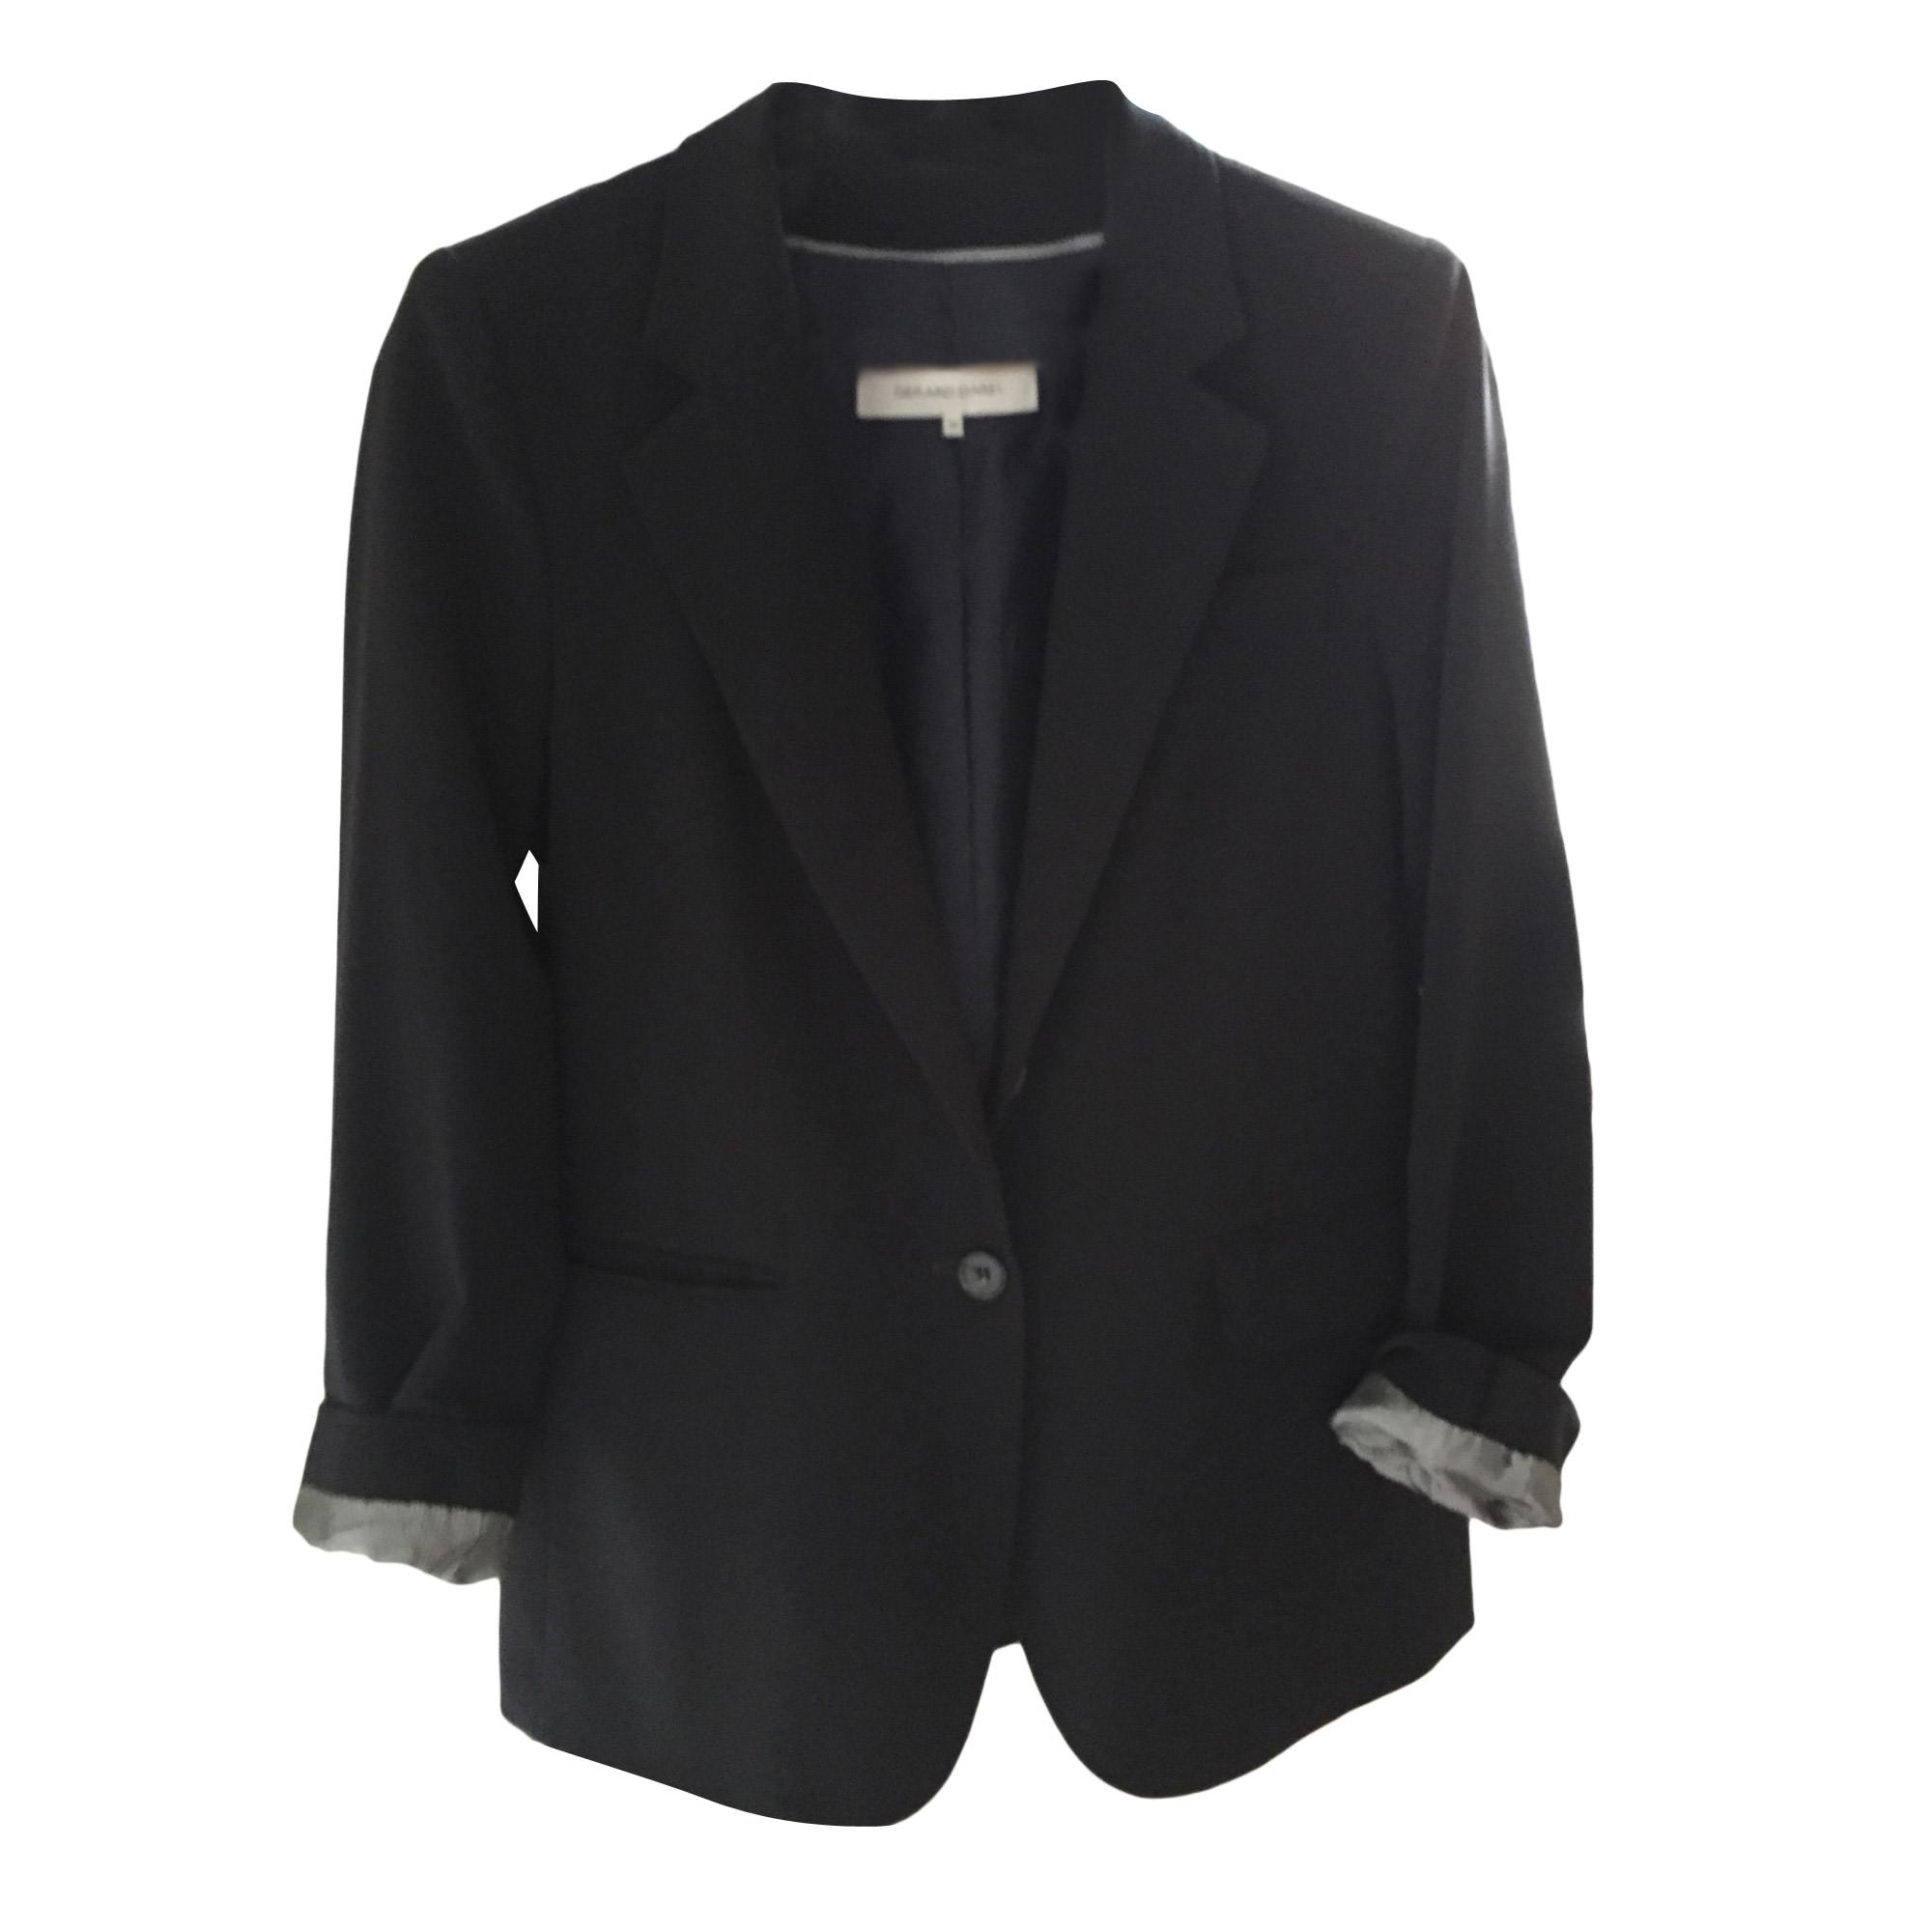 Blazer, veste tailleur GERARD DAREL 38 (M, T2) noir vendu par ... d8677f488f93